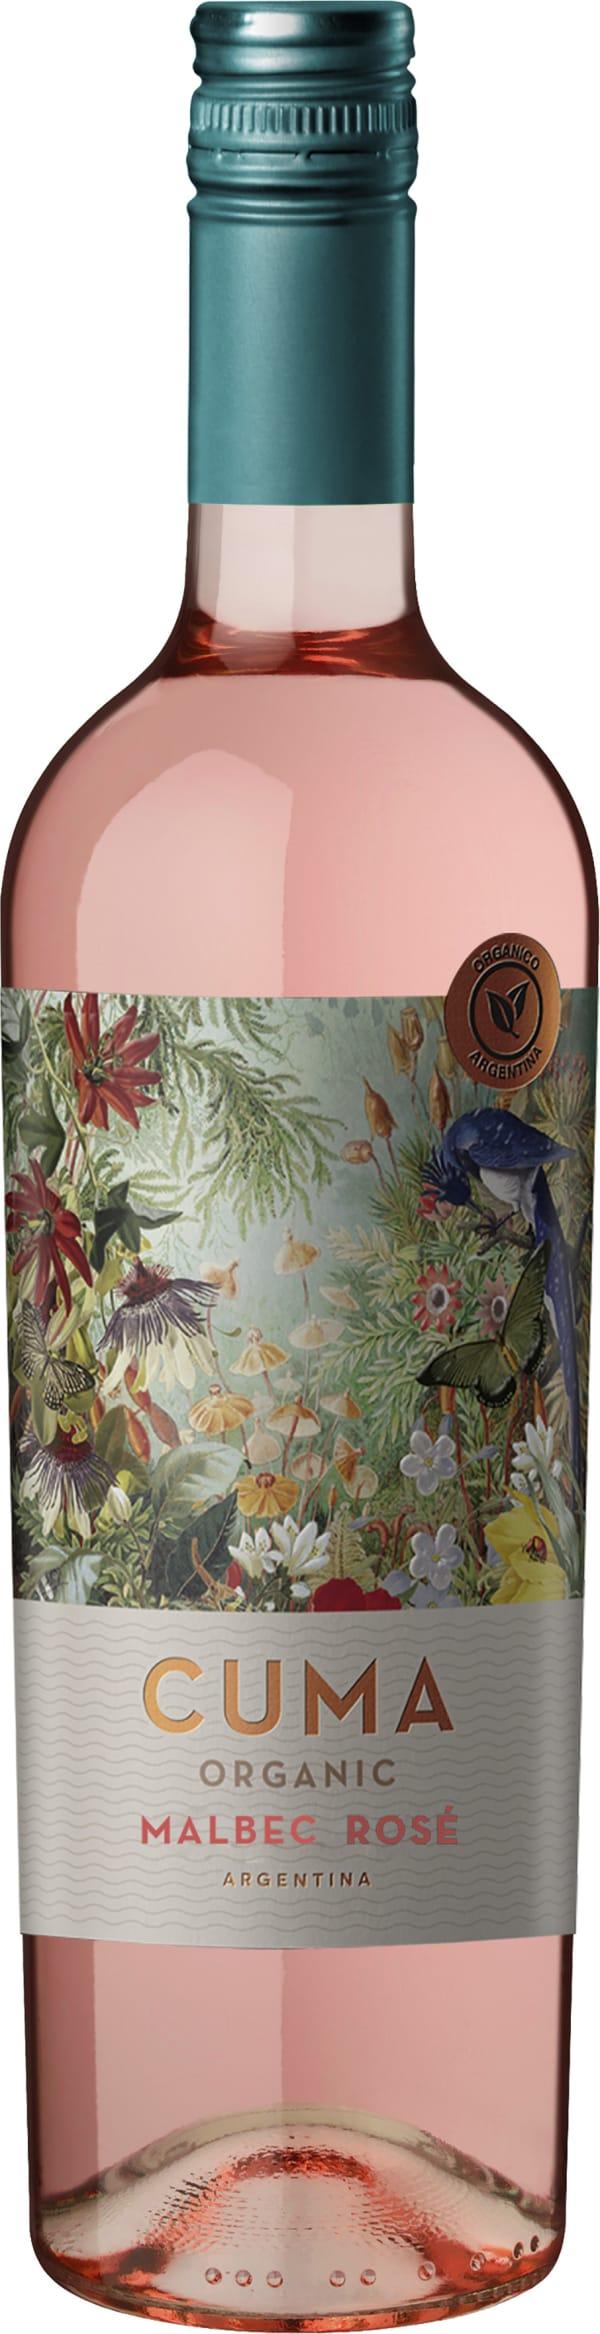 Cuma Malbec Organic Rosé 2019